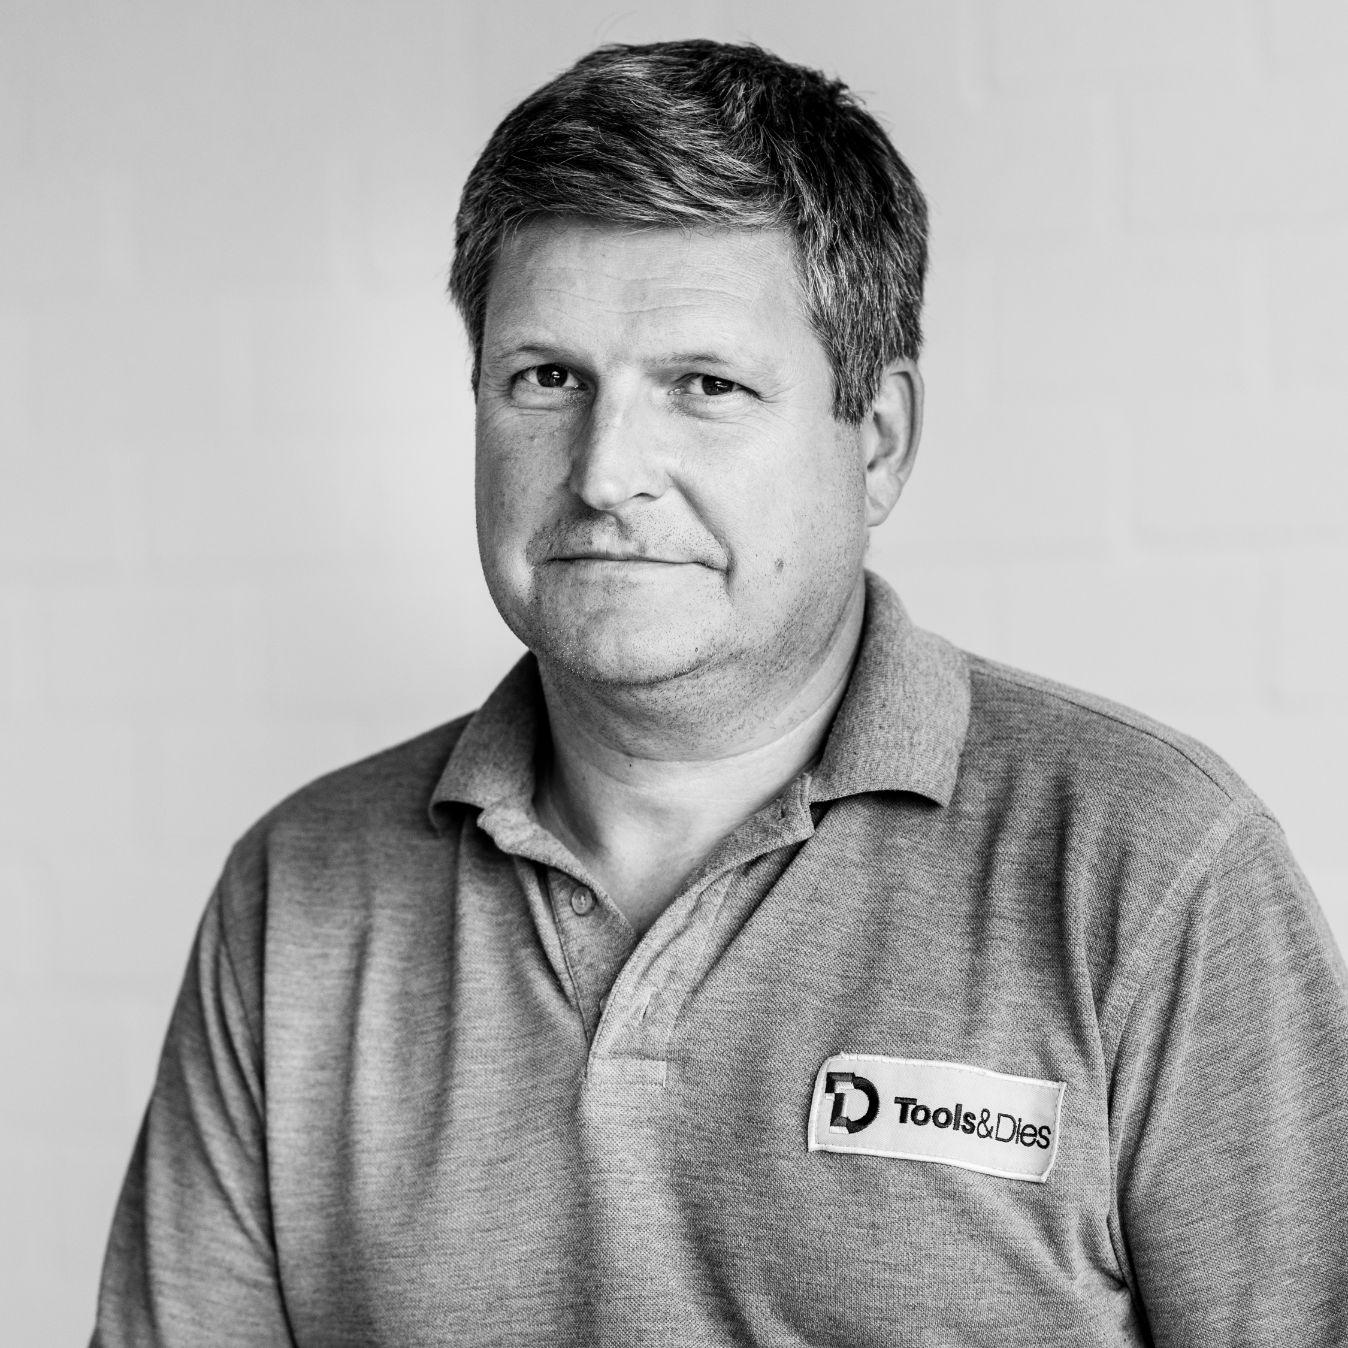 Dirk Verdonck